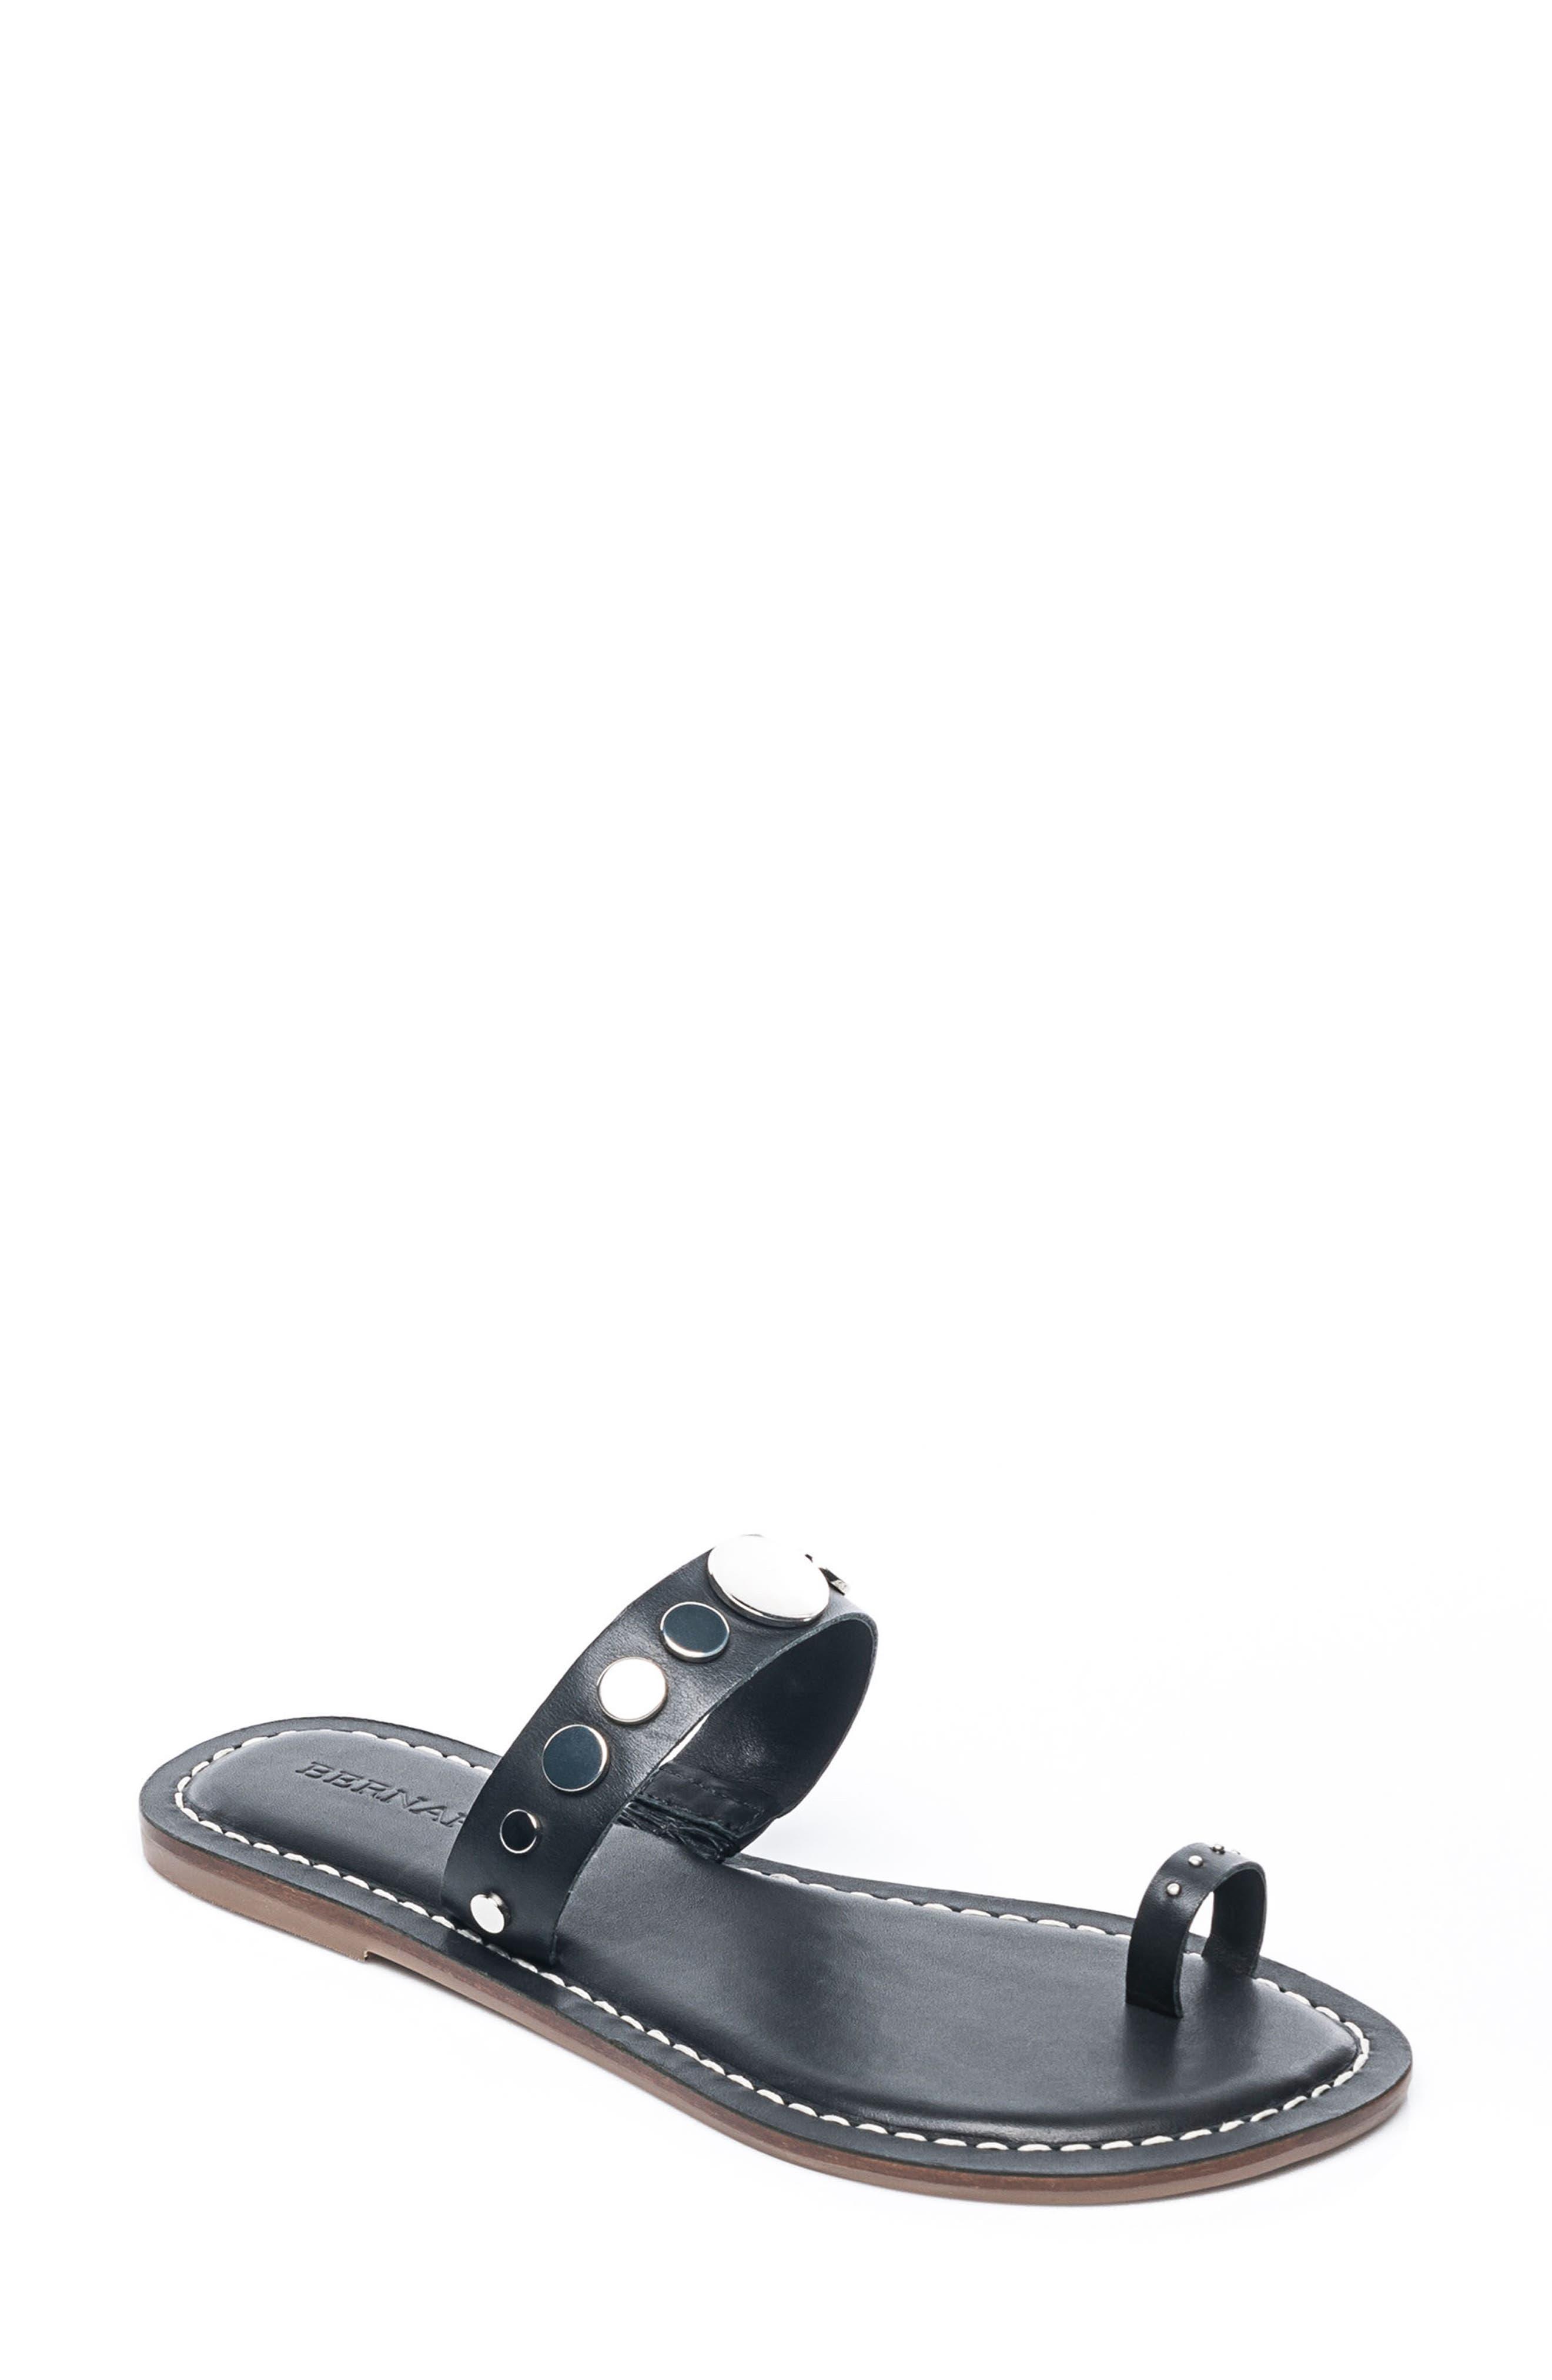 Bernardo Mattie Toe Ring Sandal,                         Main,                         color, 001